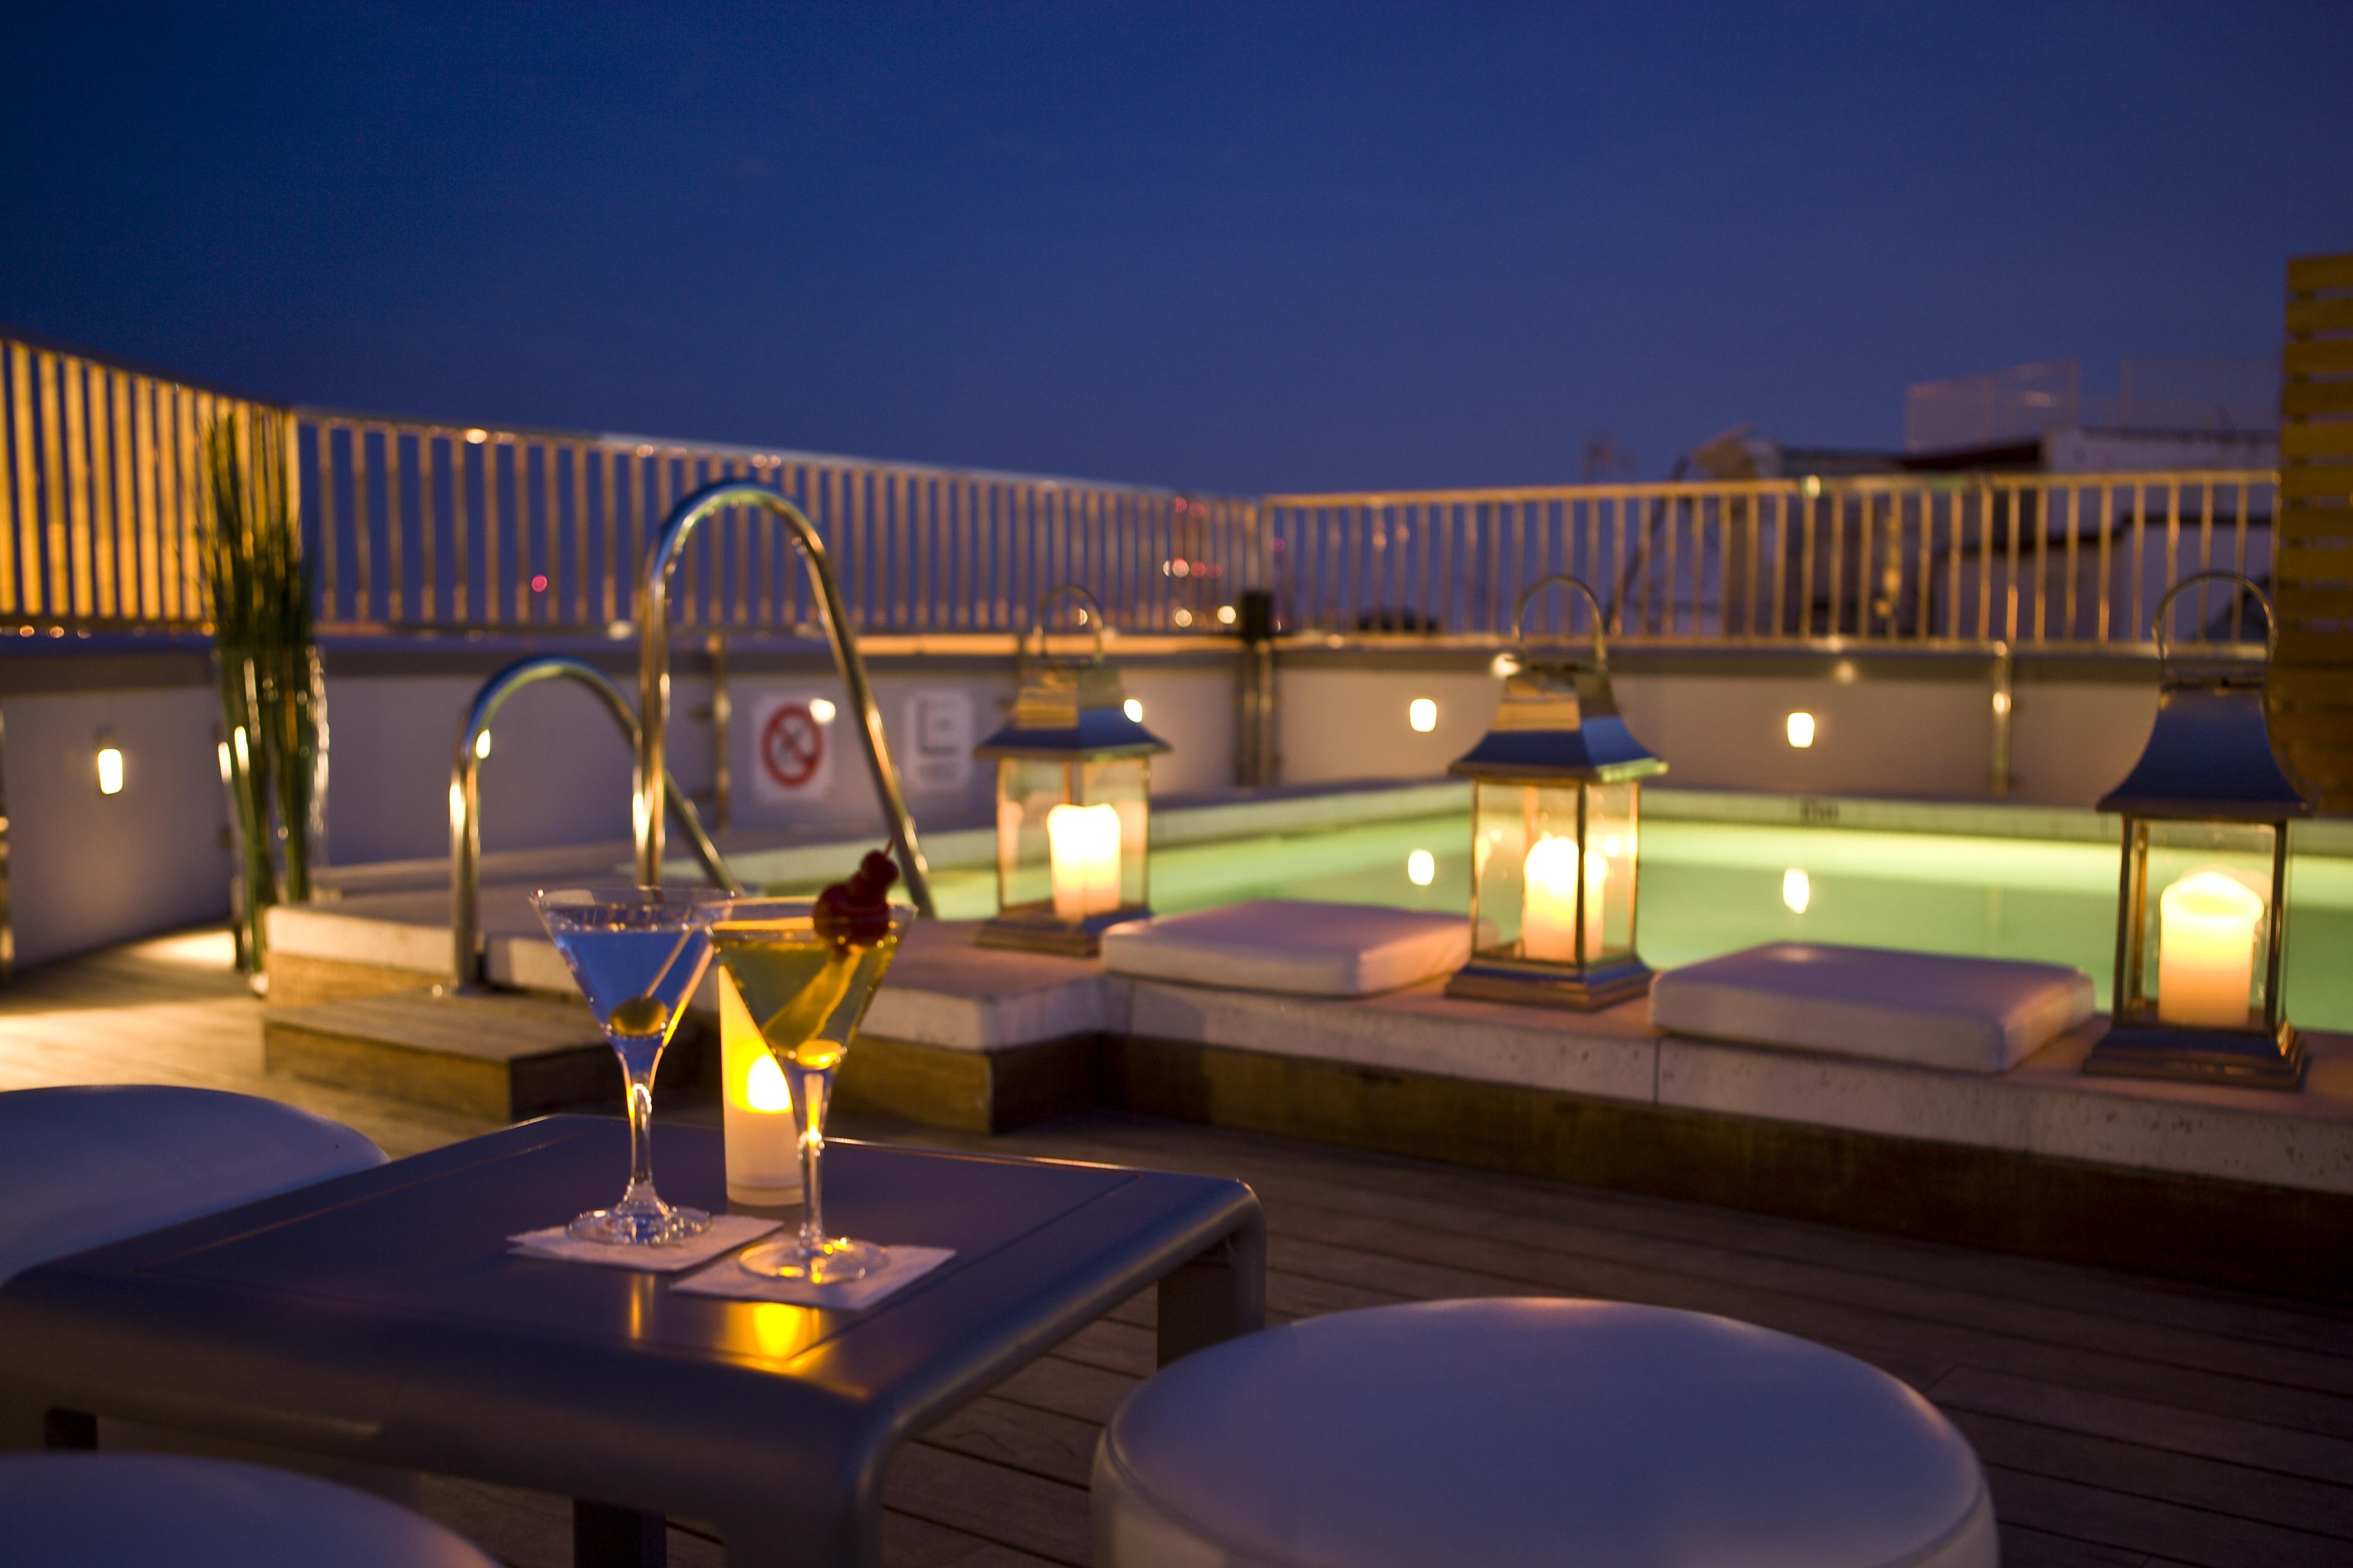 Las 10 mejores terrazas con piscina en hoteles espa oles for Hotel con piscina en cordoba